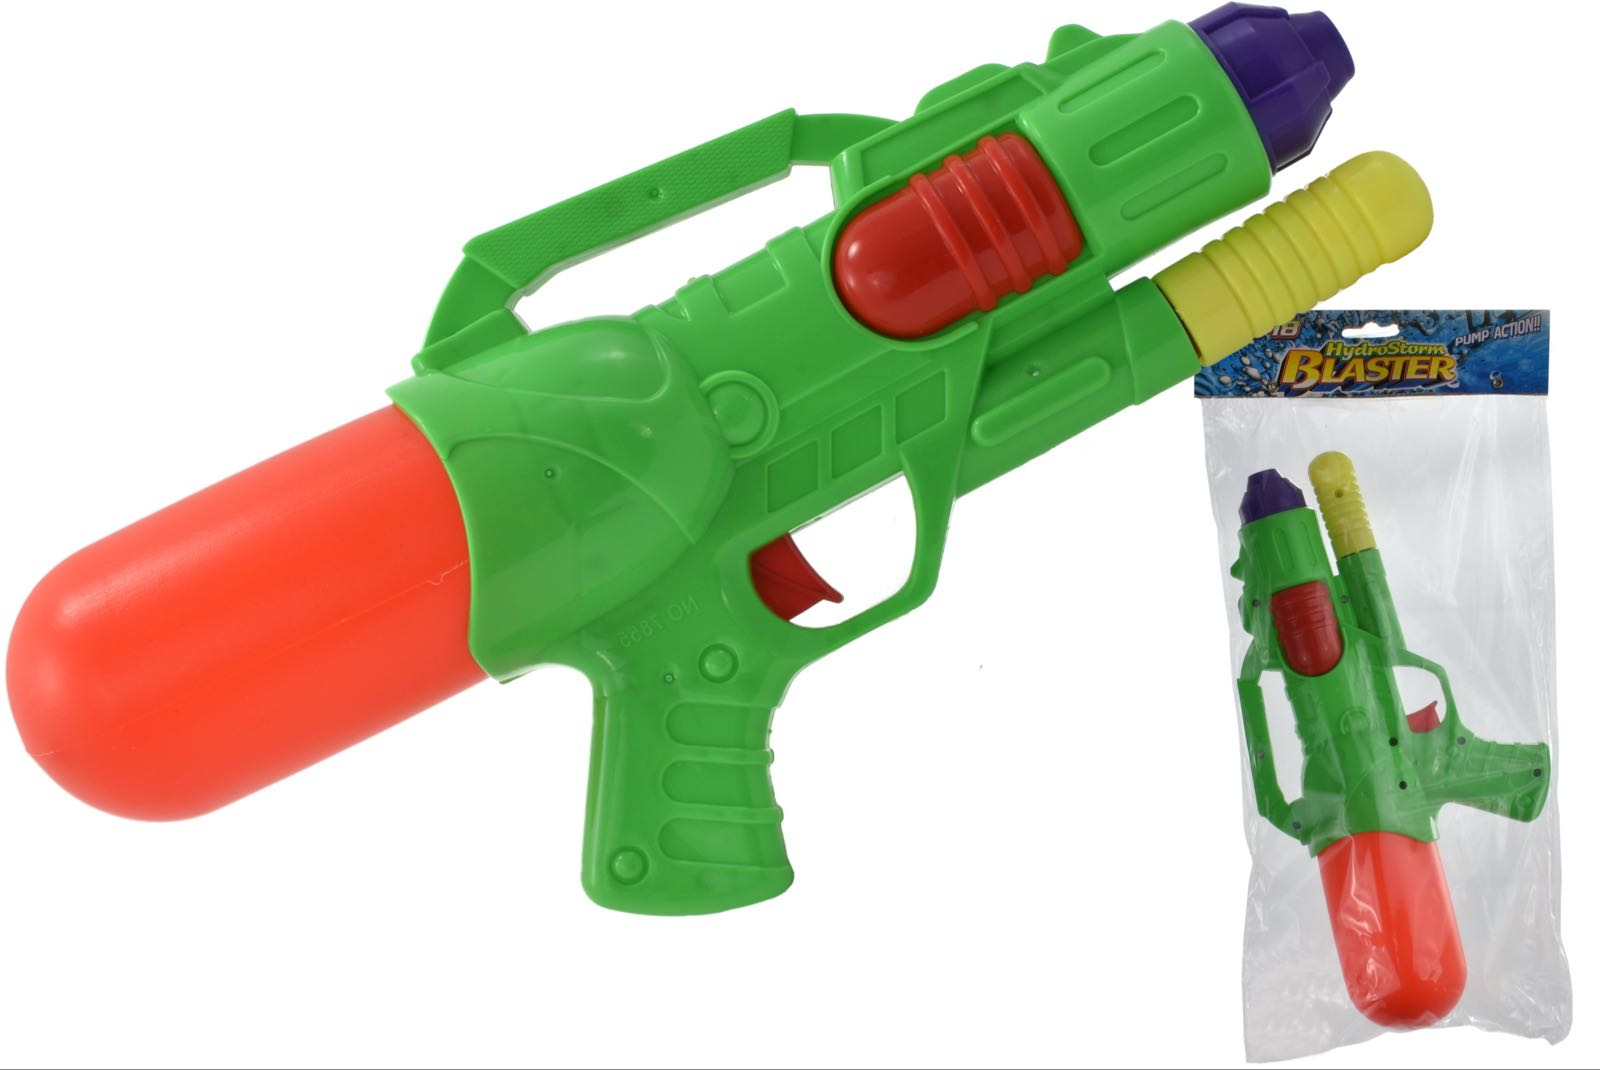 Small Water Gun